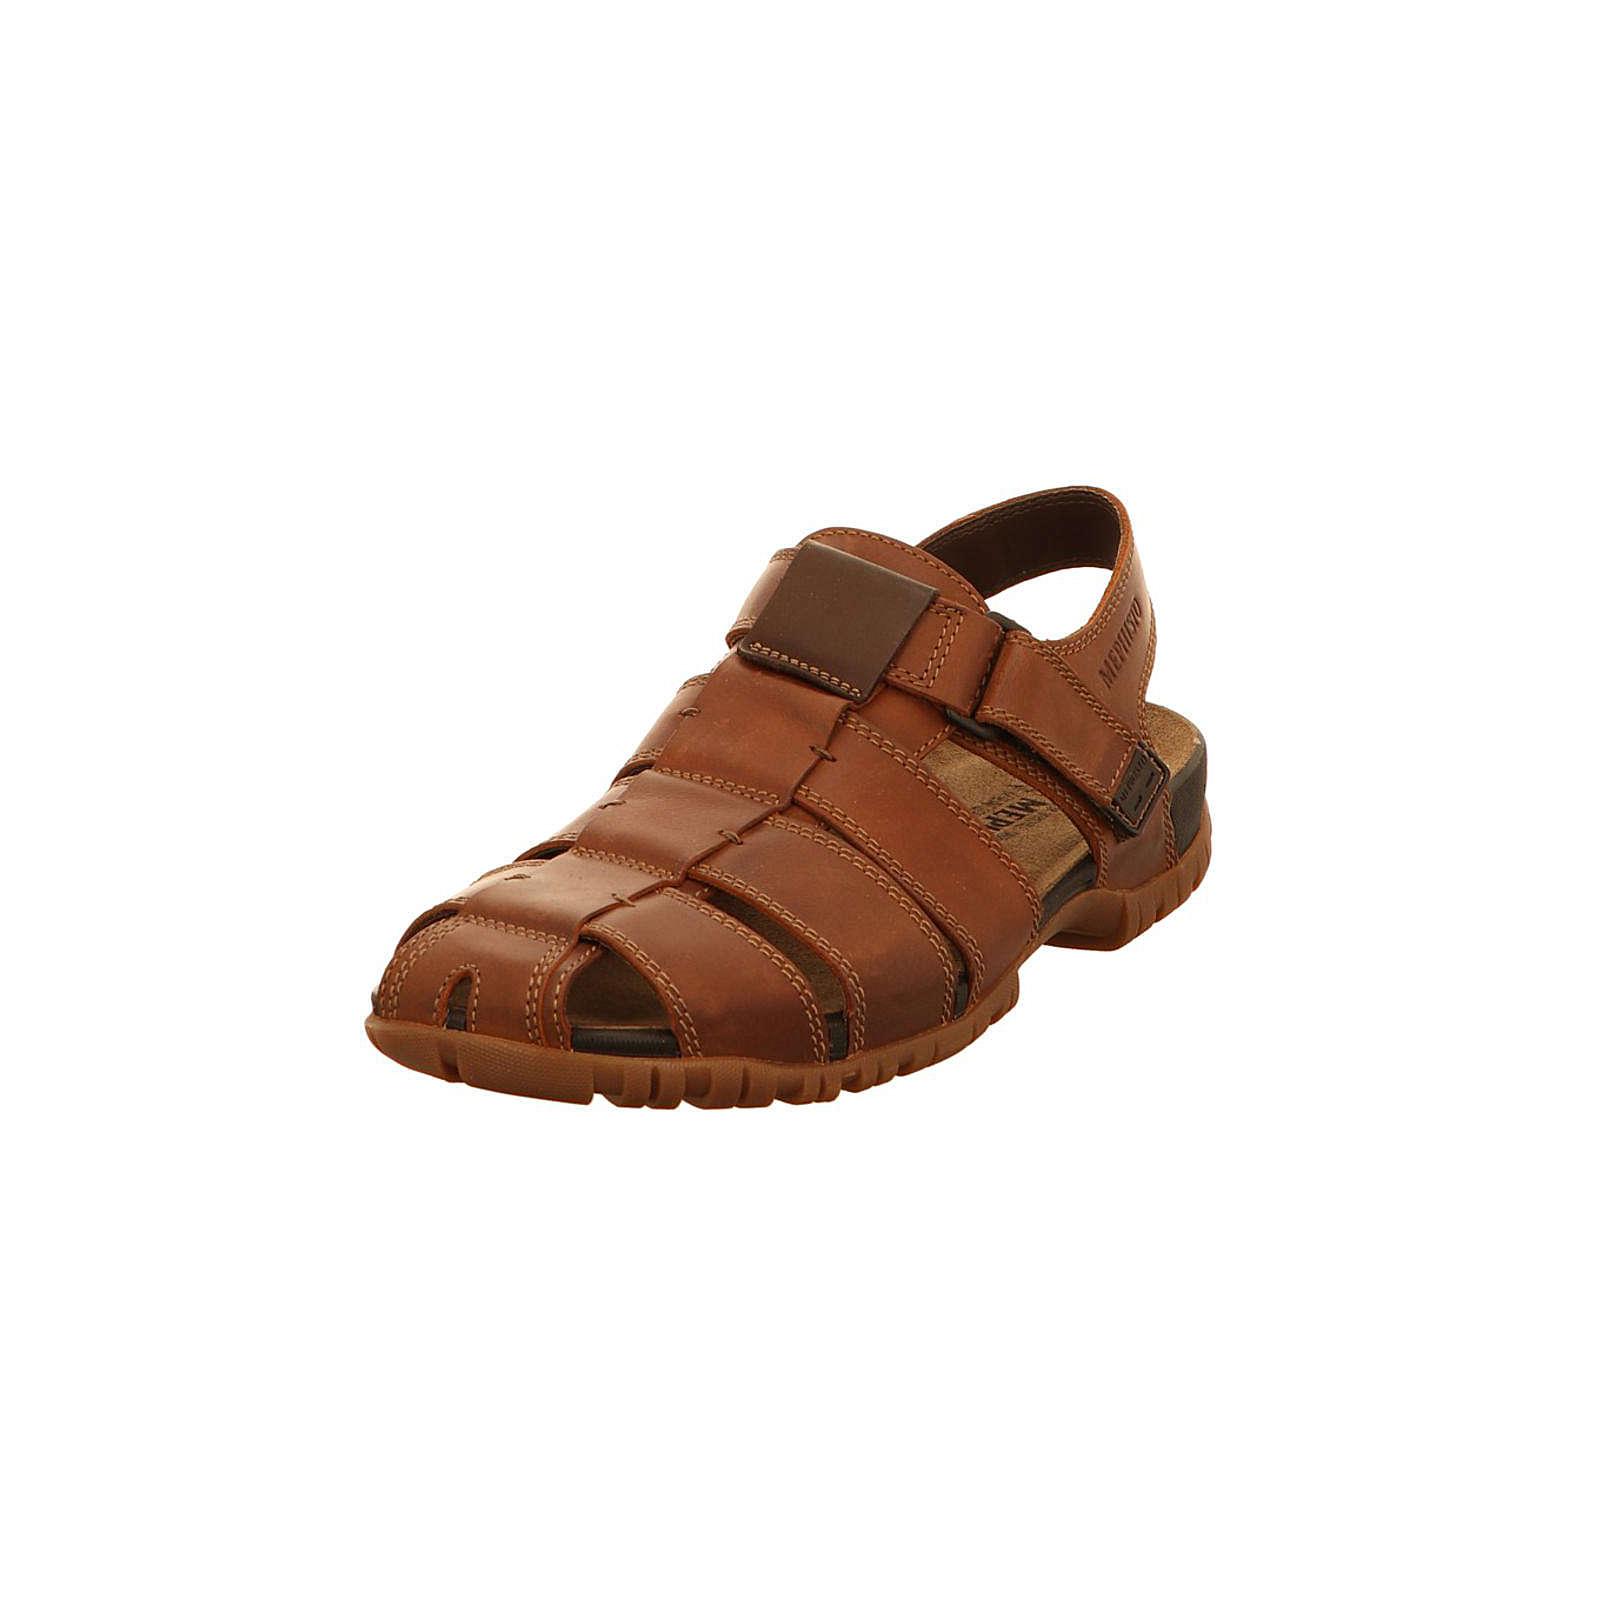 MEPHISTO Klassische Sandalen braun Herren Gr. 42